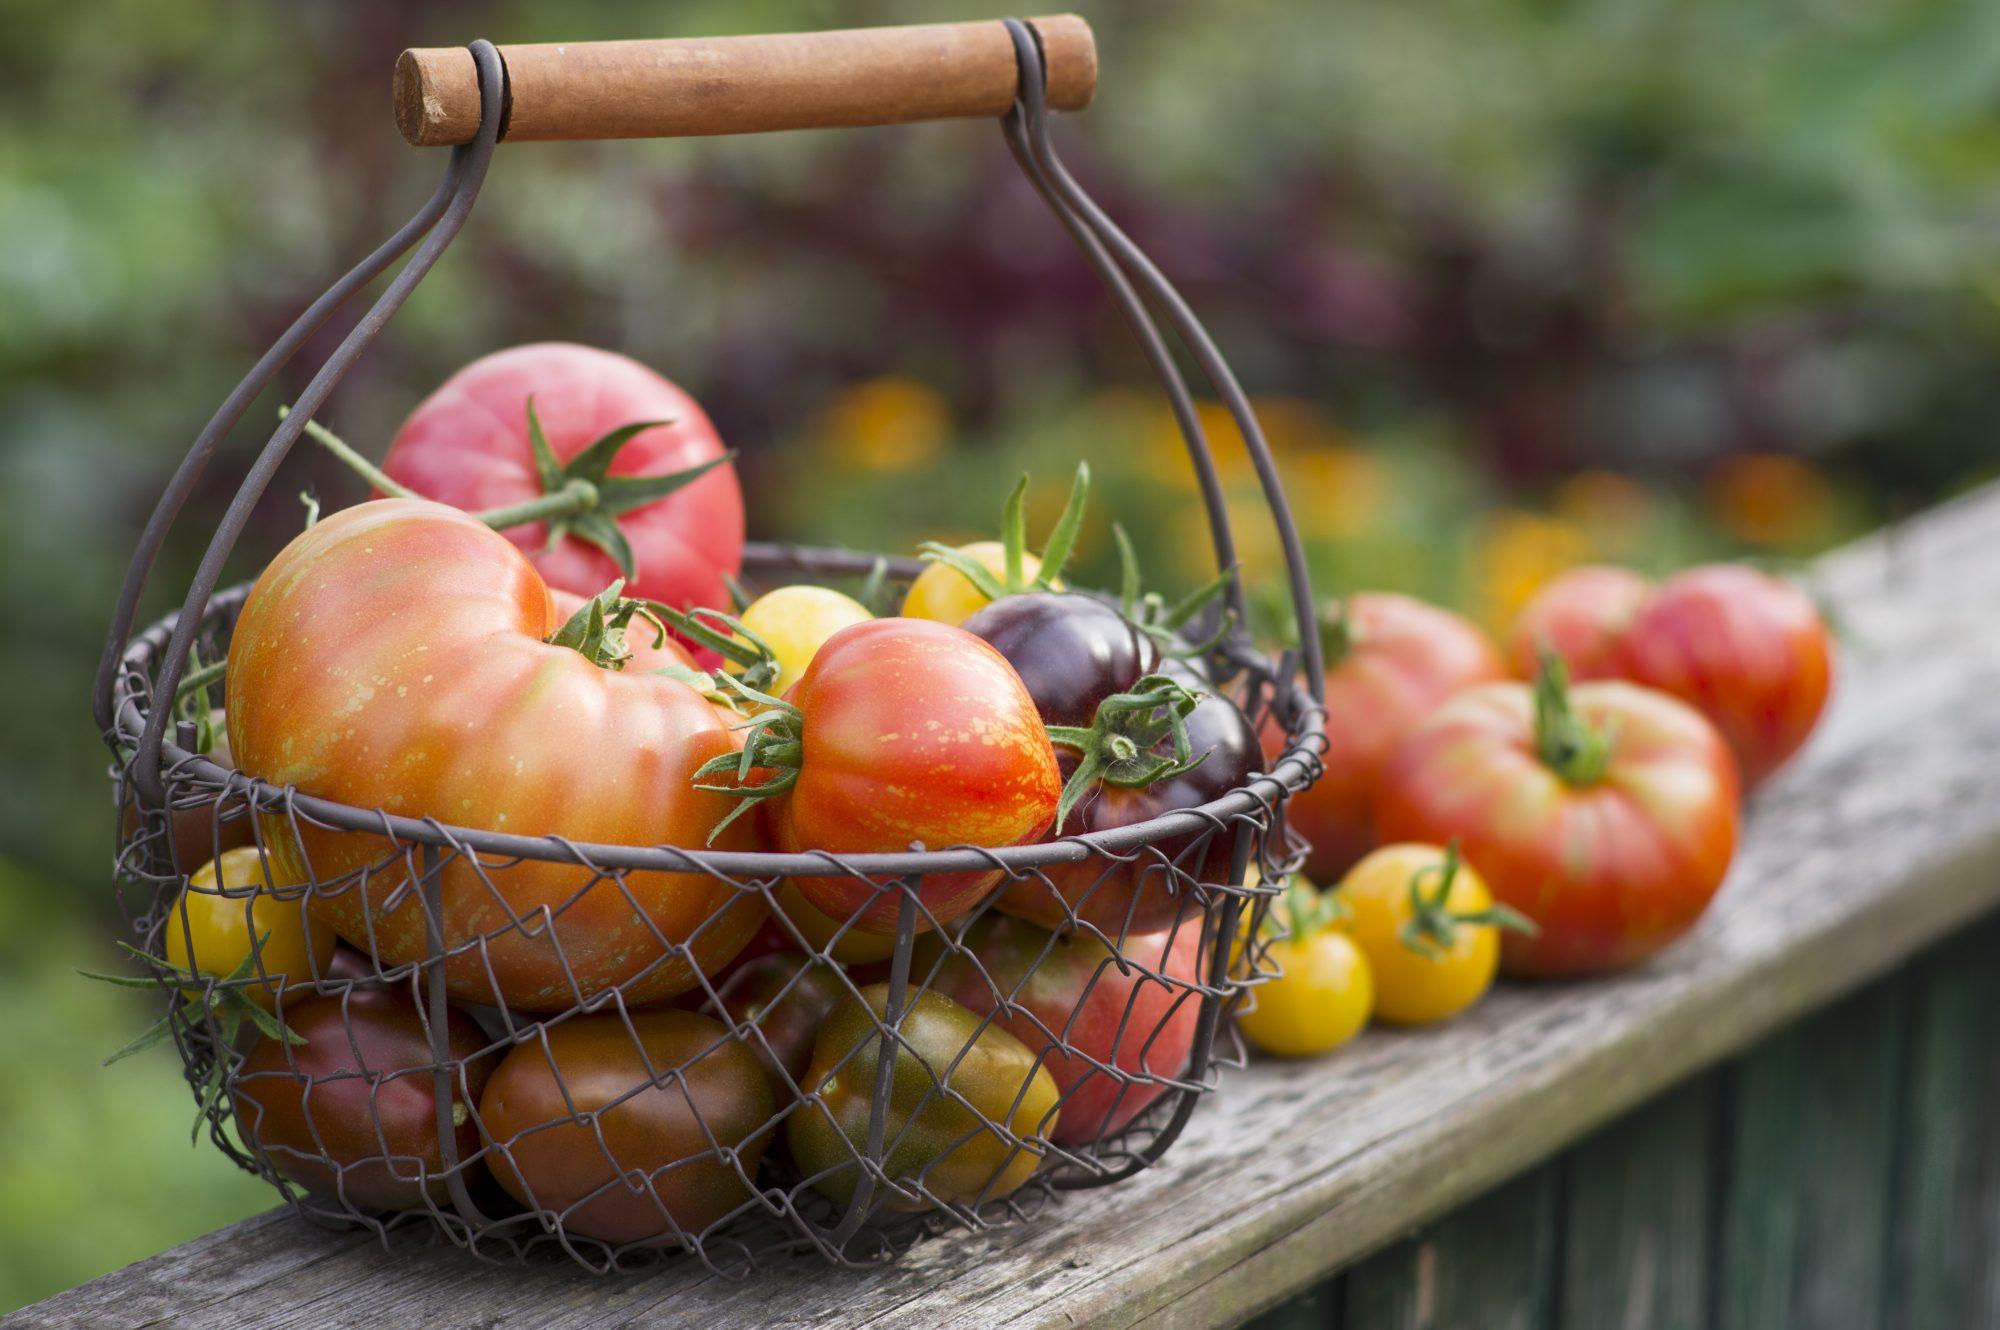 getty heirloom tomato image